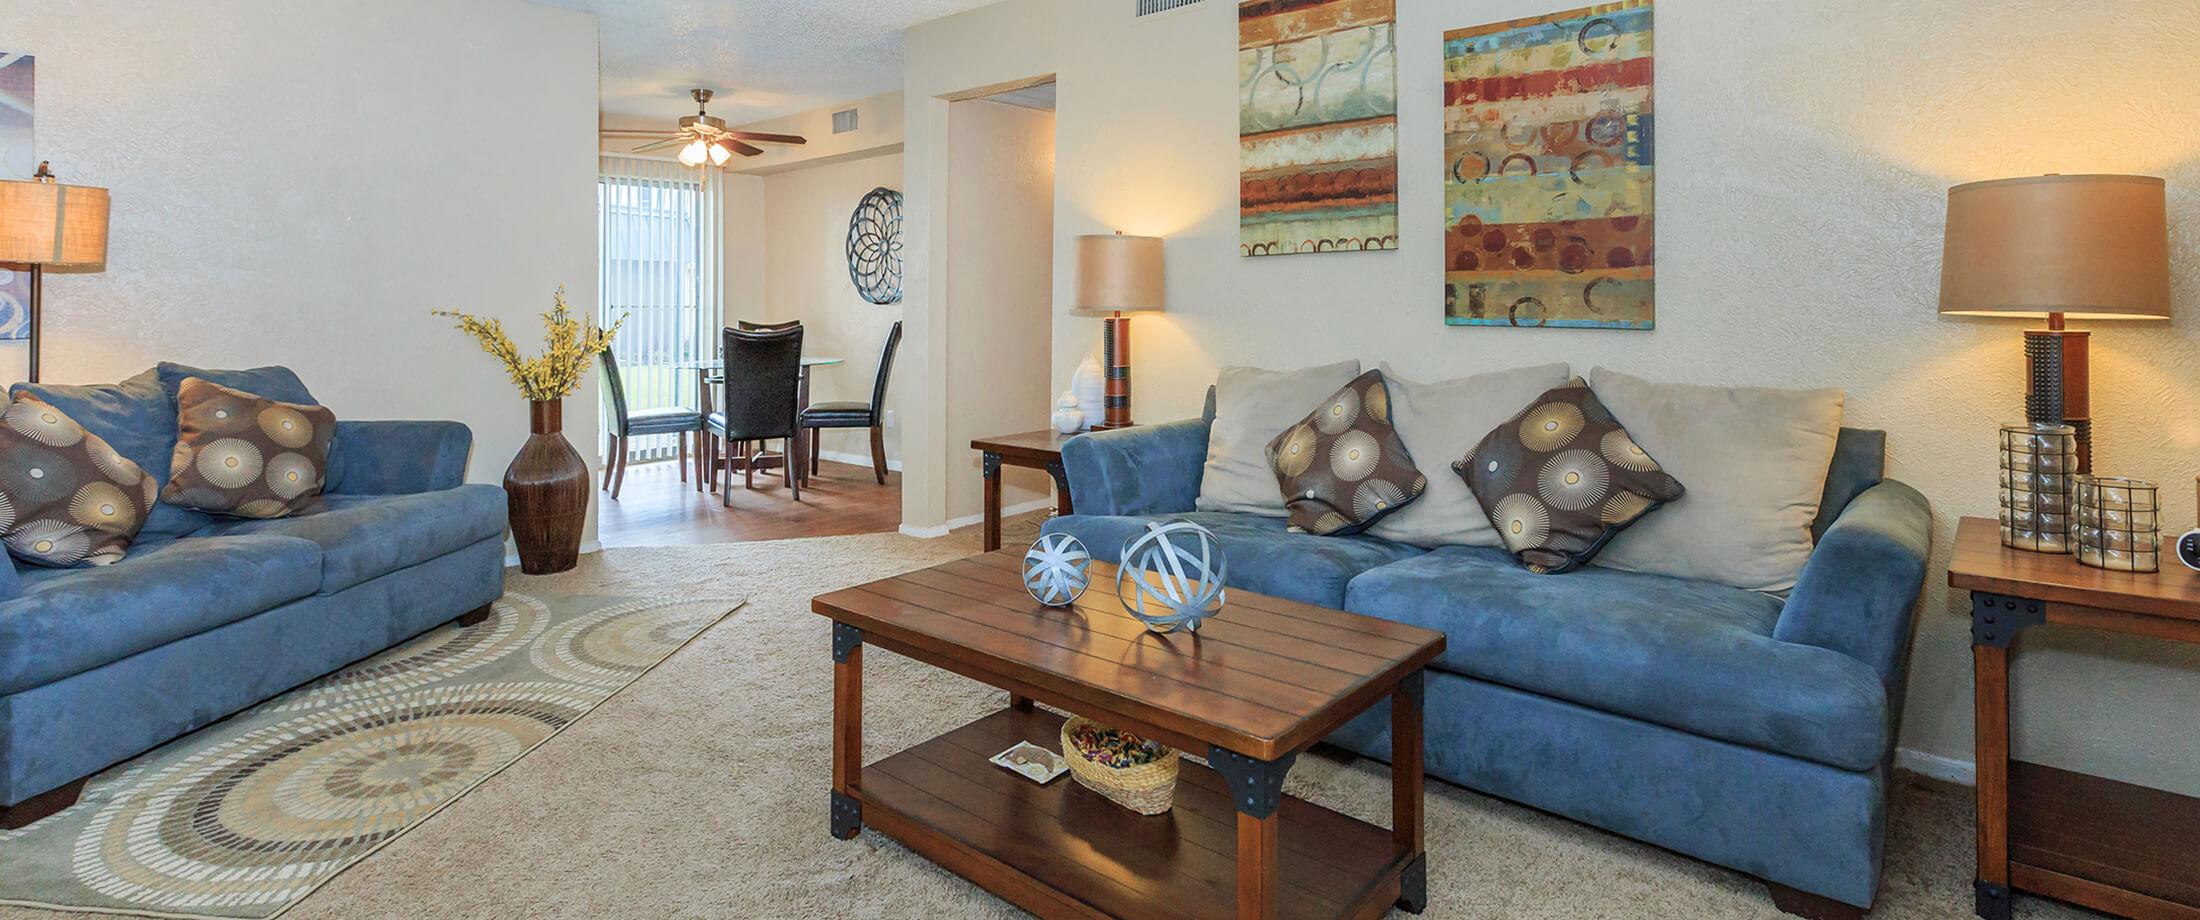 waterford glen apartments in wichita falls tx